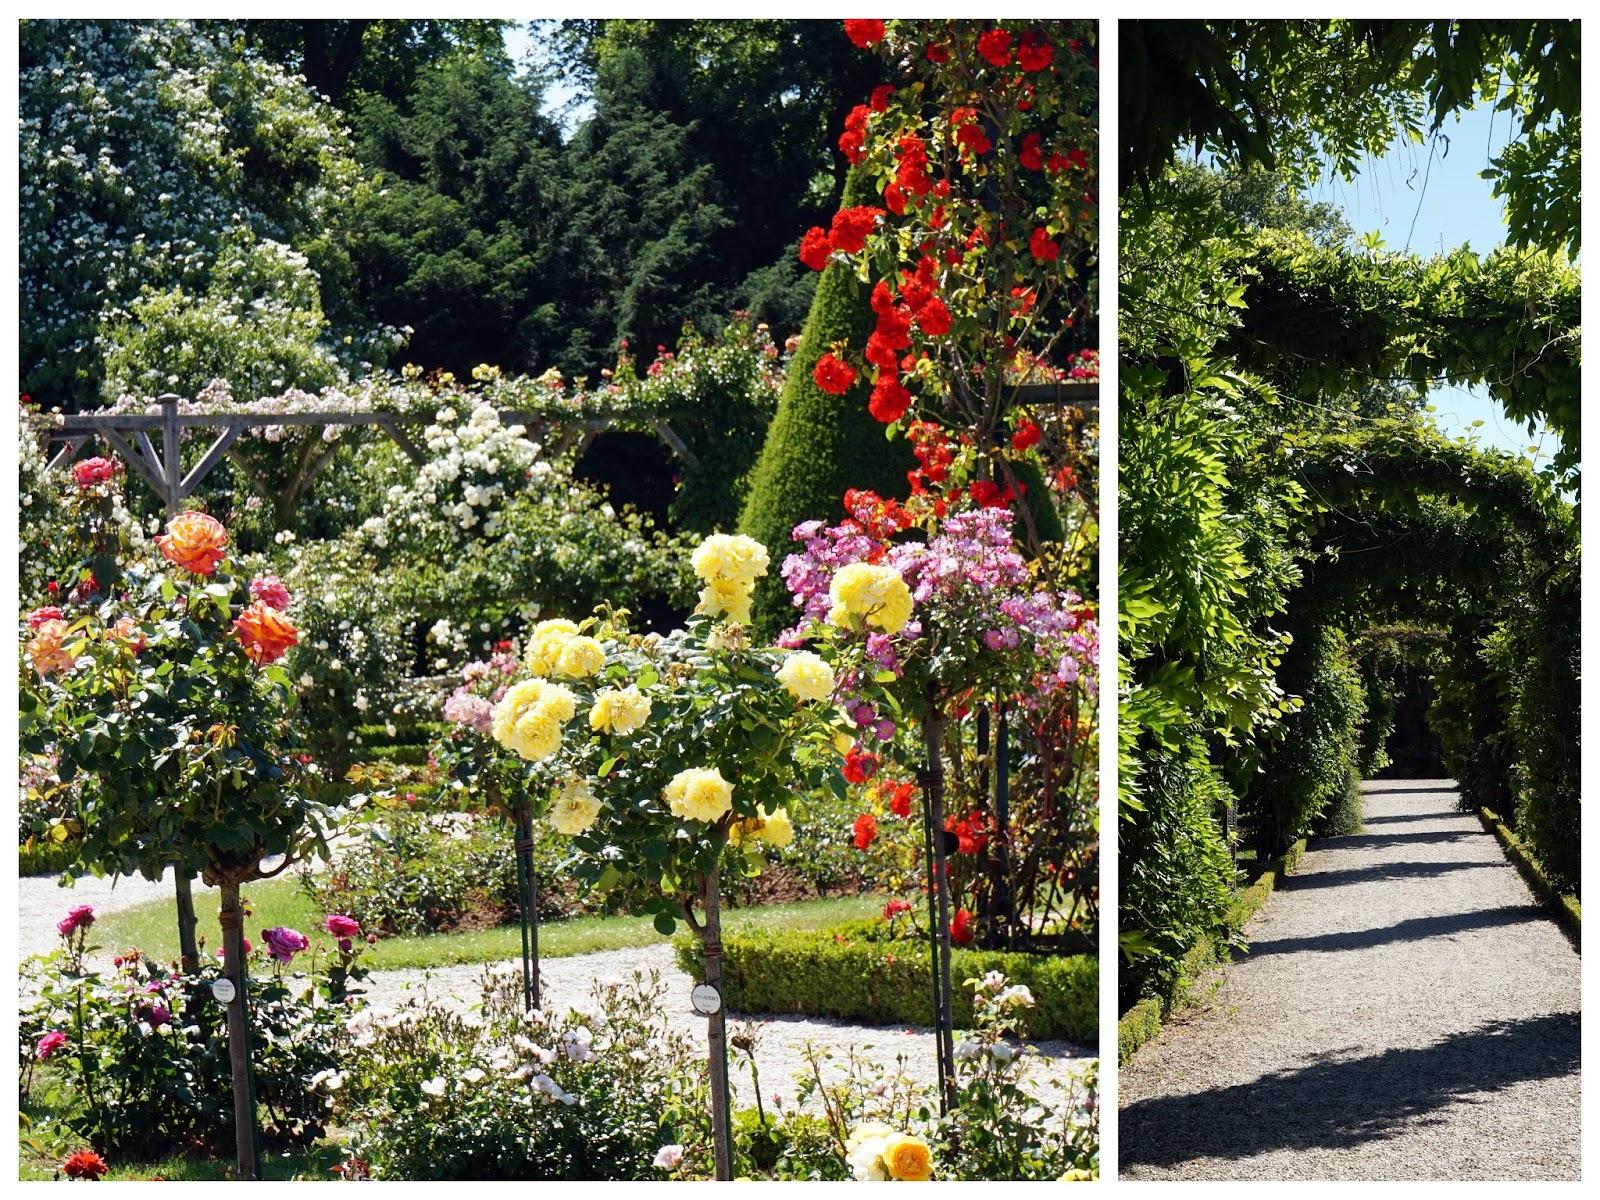 Passion terrasse fl nerie au jardin de bagatelle for Jardin bagatelle